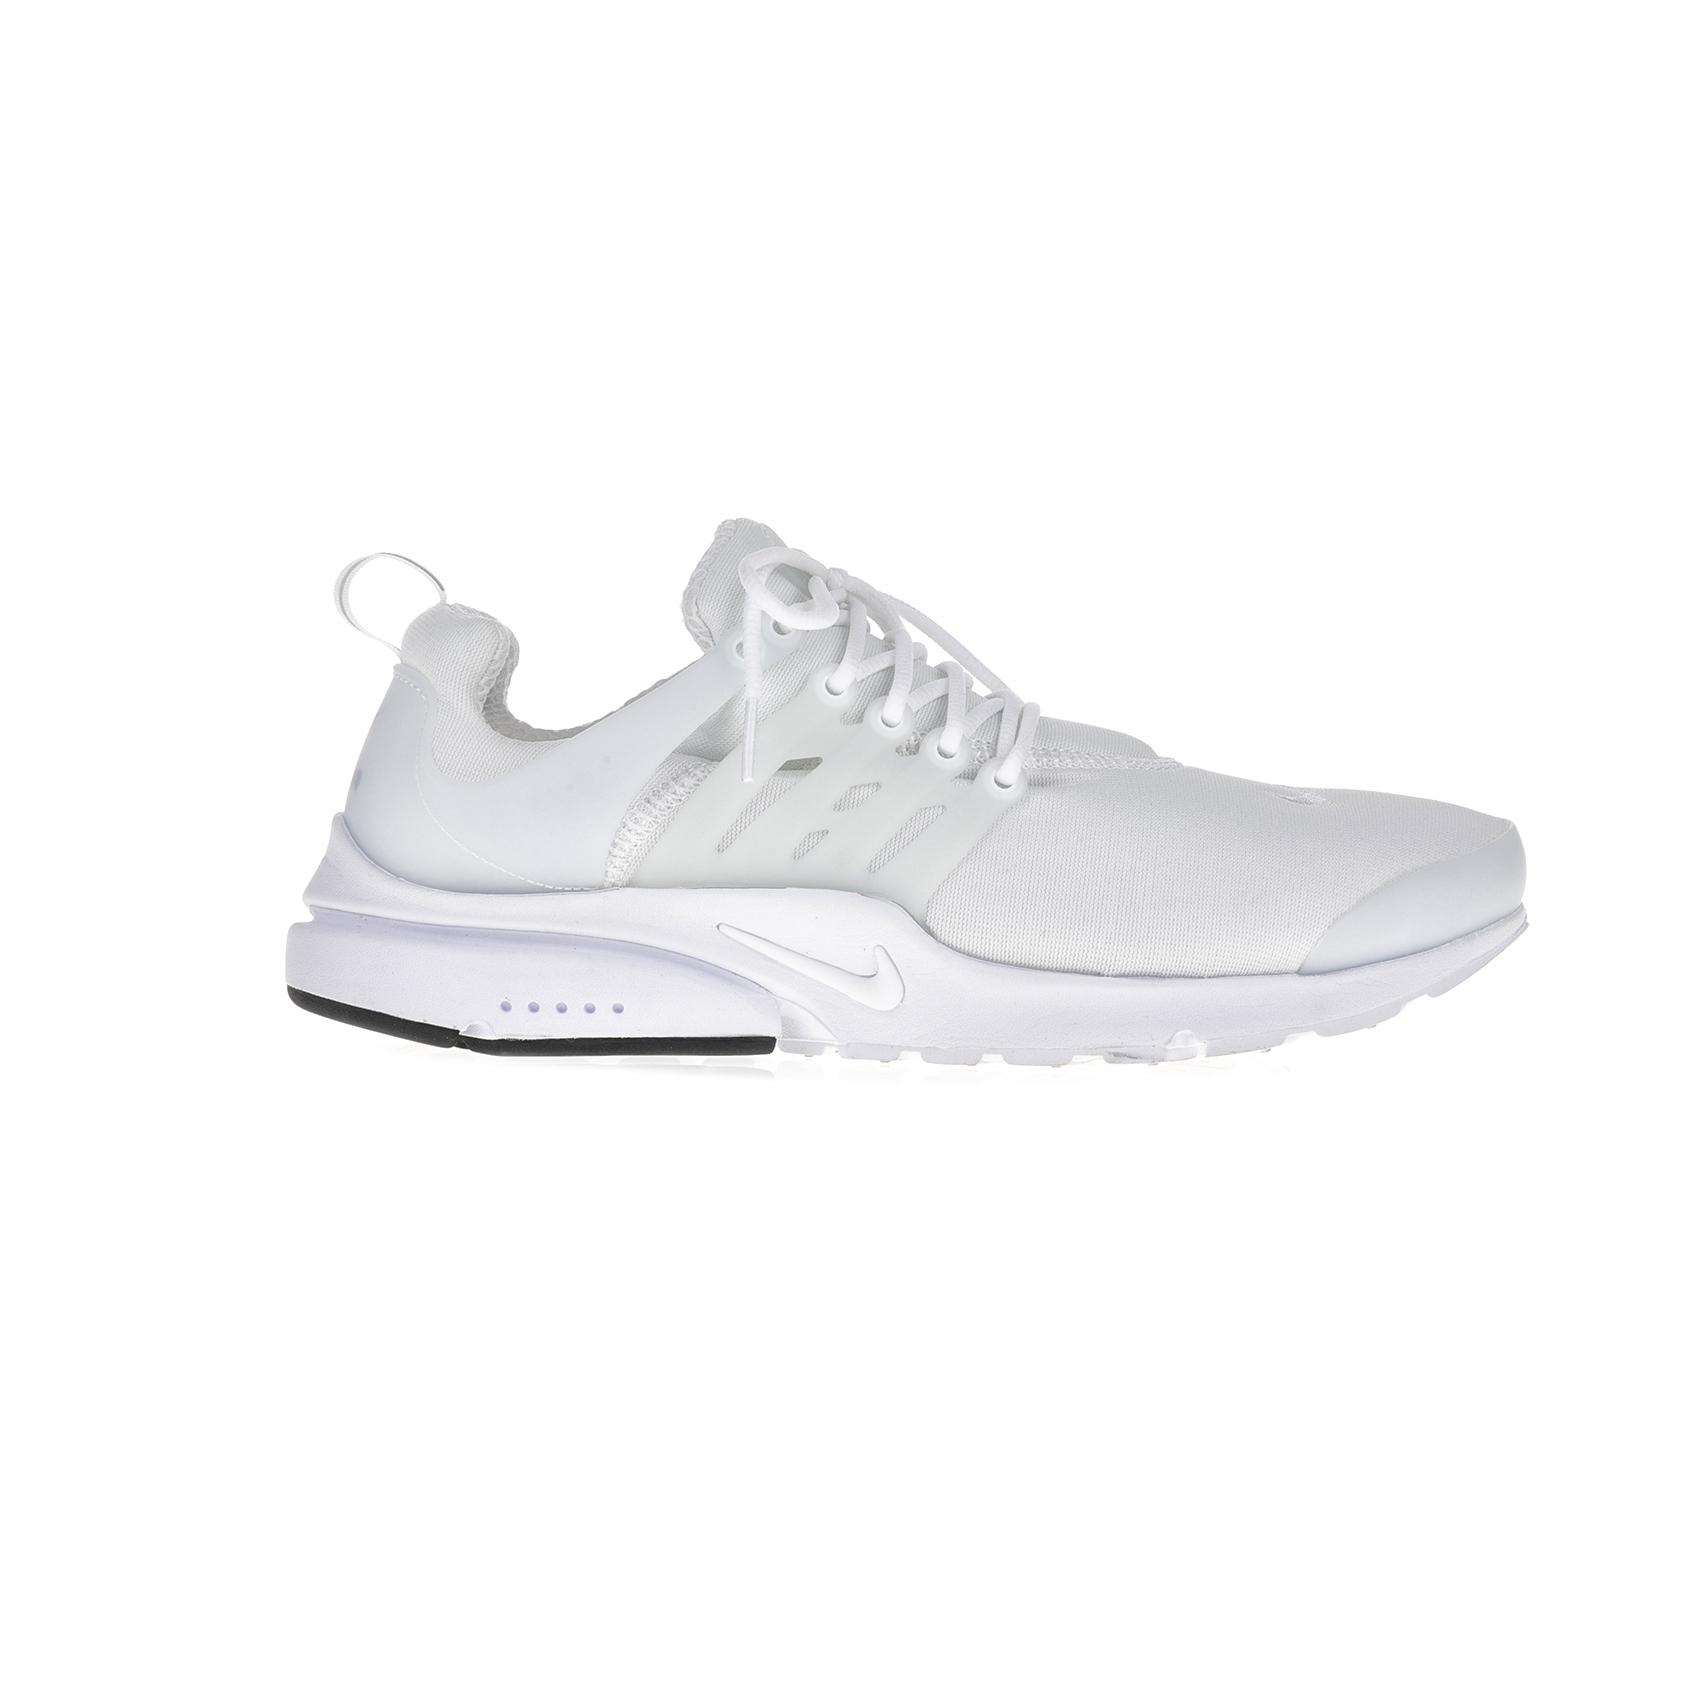 28c4f3c7f96 NIKE - Ανδρικά αθλητικά παπούτσια Nike AIR PRESTO ESSENTIAL λευκά